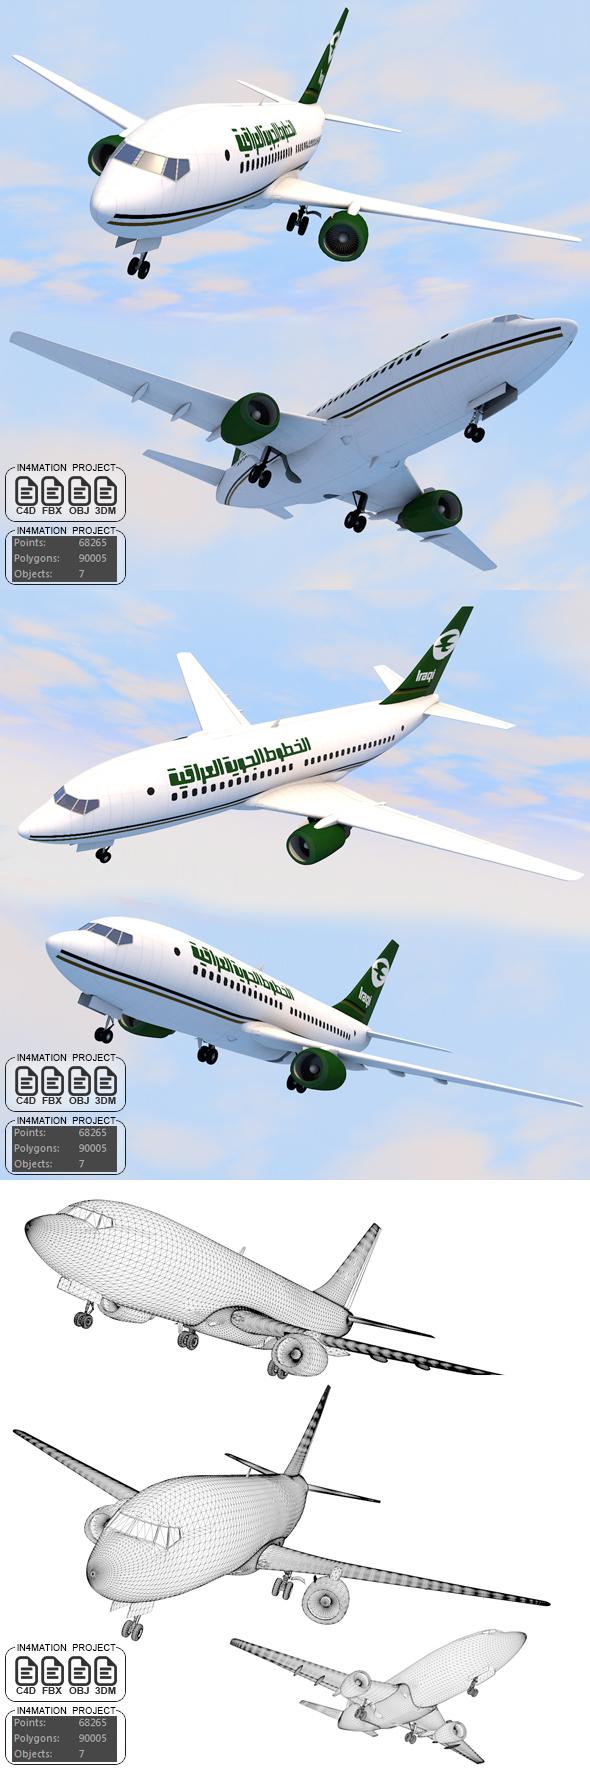 Iraqi Airways - 3DOcean Item for Sale